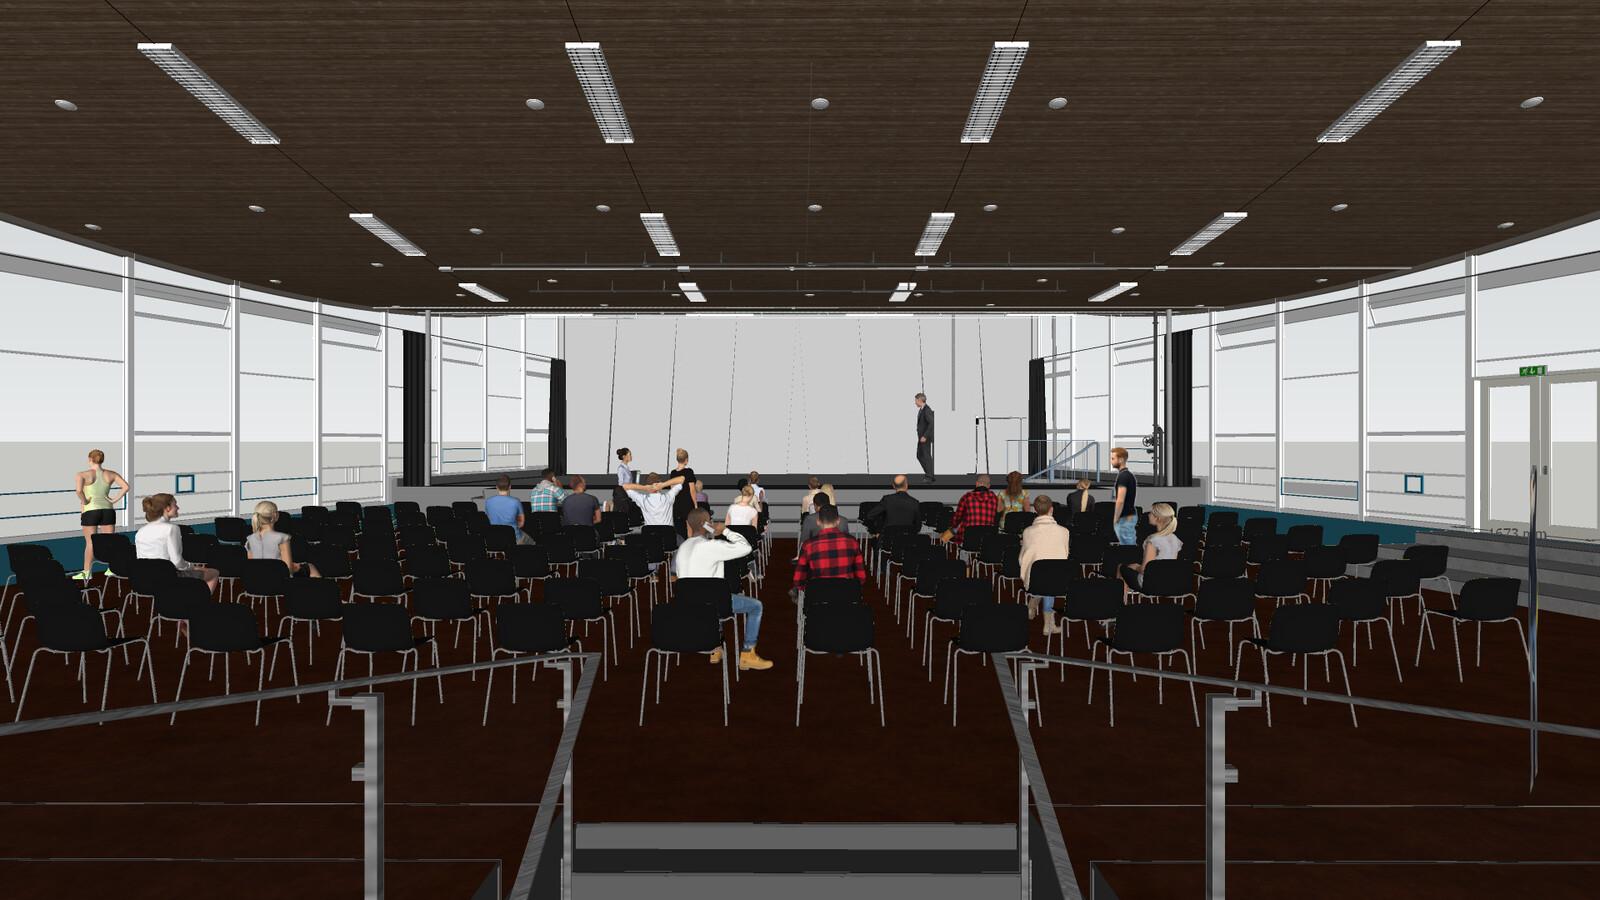 SketchUp 2021  Broedplaats LELY (The Lely Incubator) Auditorium Amsterdam Showroom-Scene 1C SU